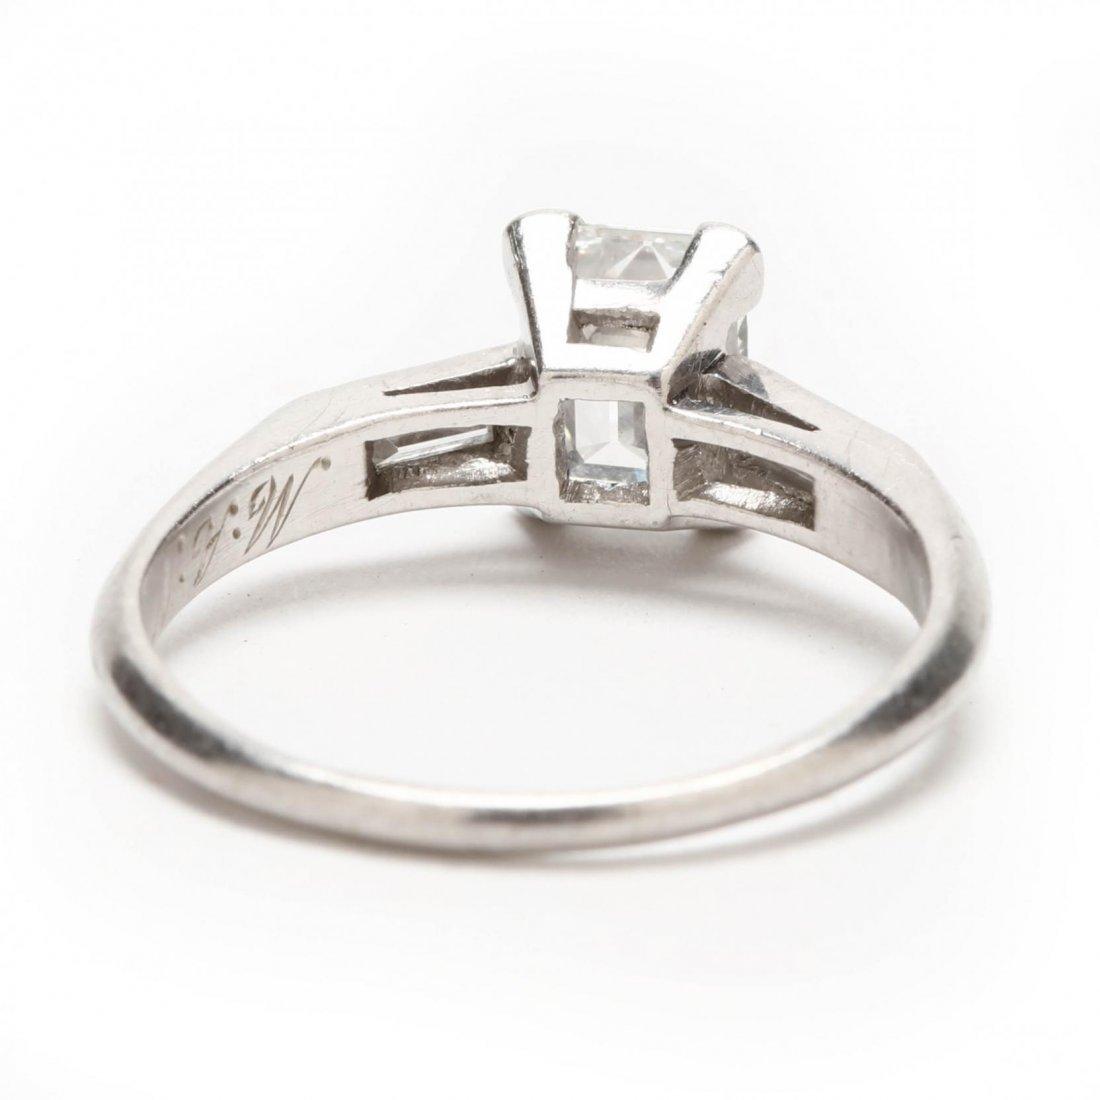 Platinum and Diamond Ring - 9